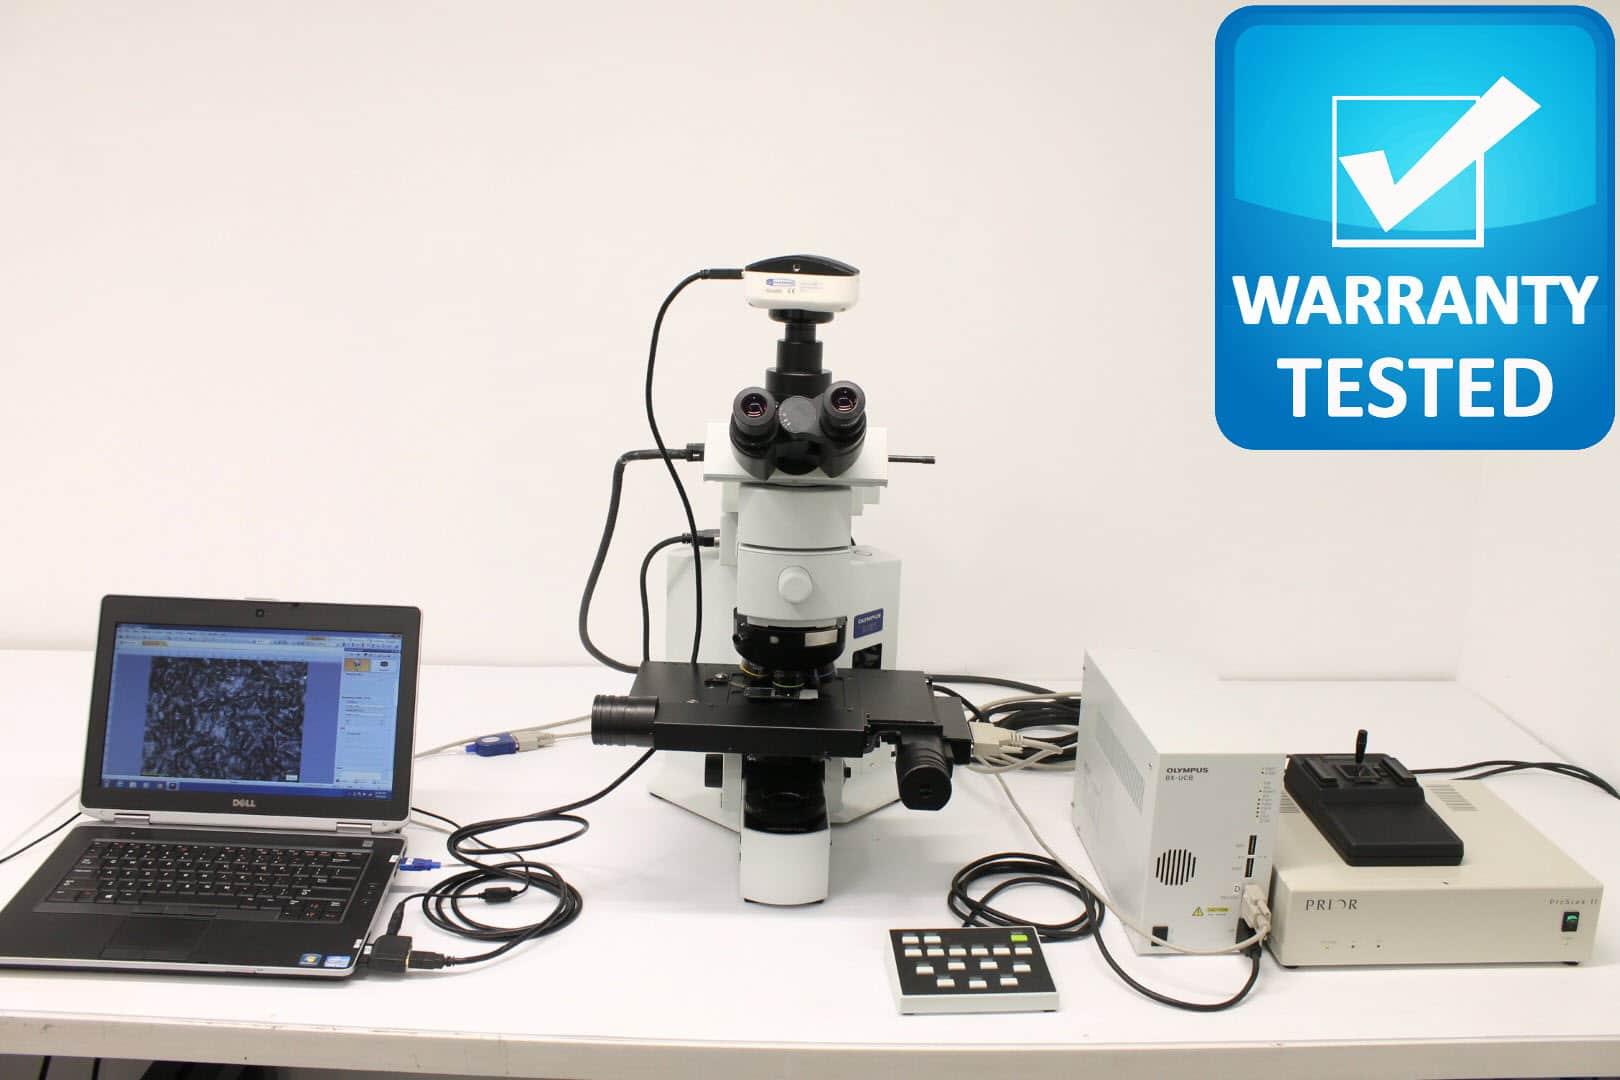 Olympus BX61 Microscope with Motorized Autofocus Reflective